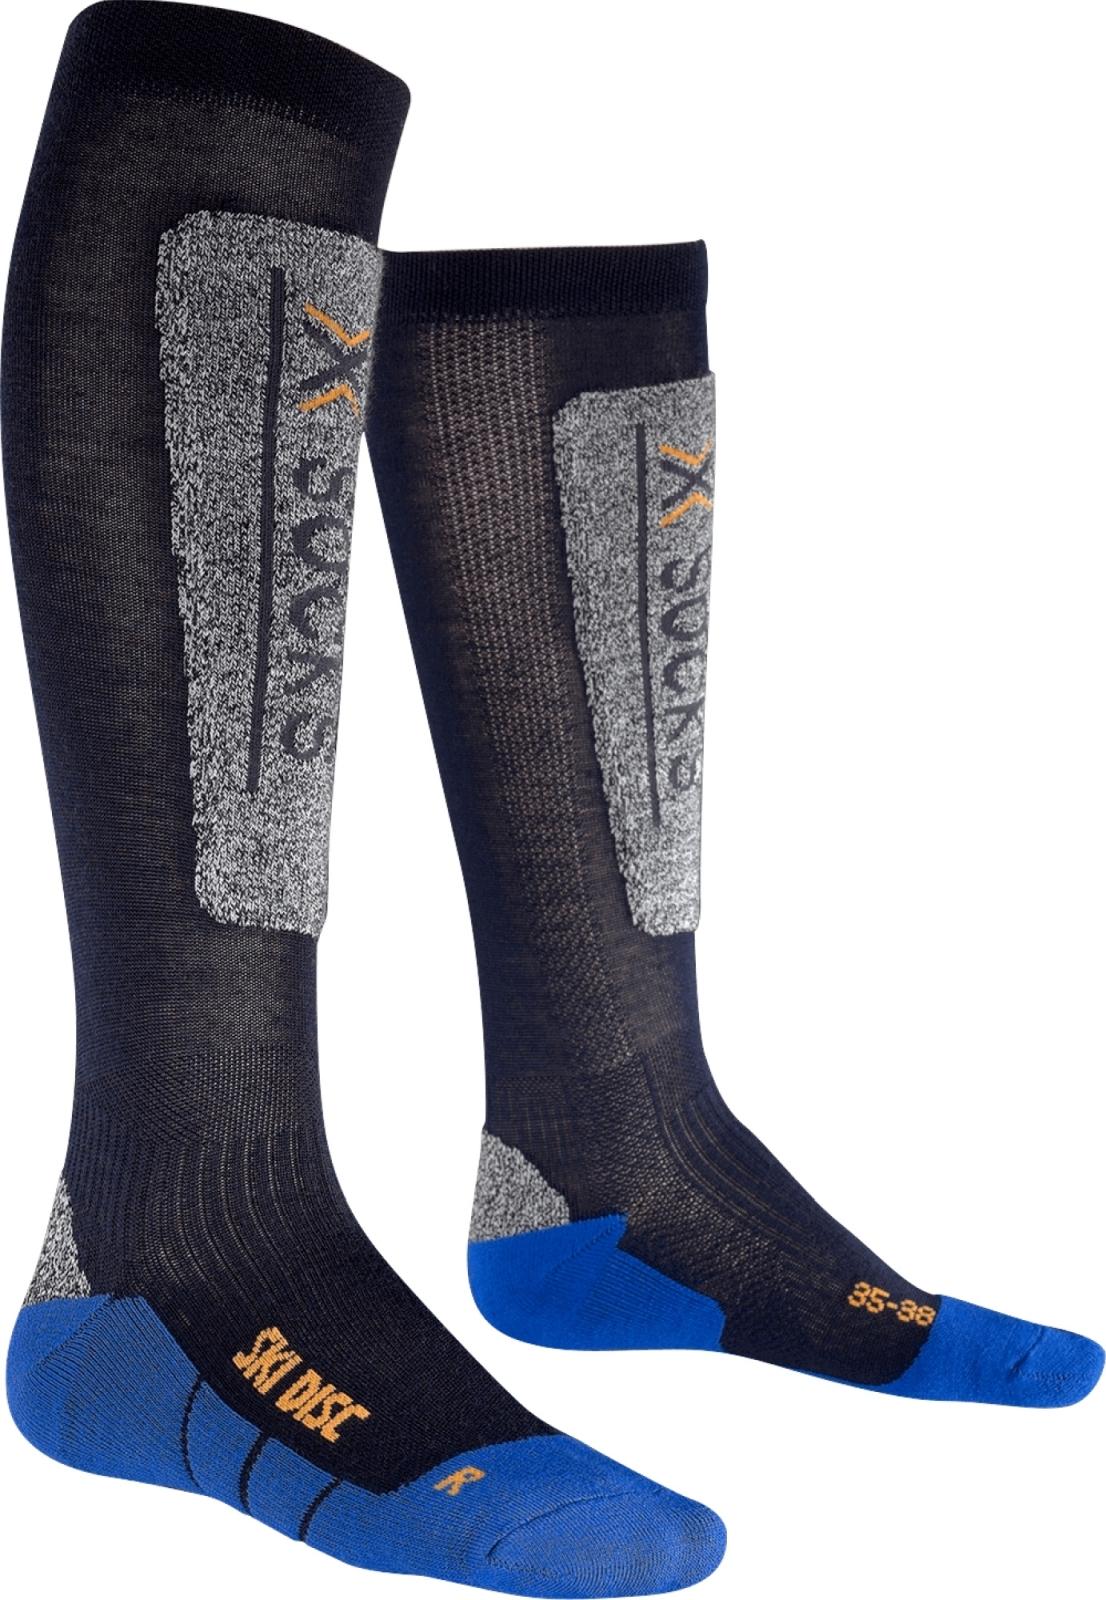 X-Socks Ski Discovery Junior Socks - Blue Marine/Cobalt Blue 24/26 X97